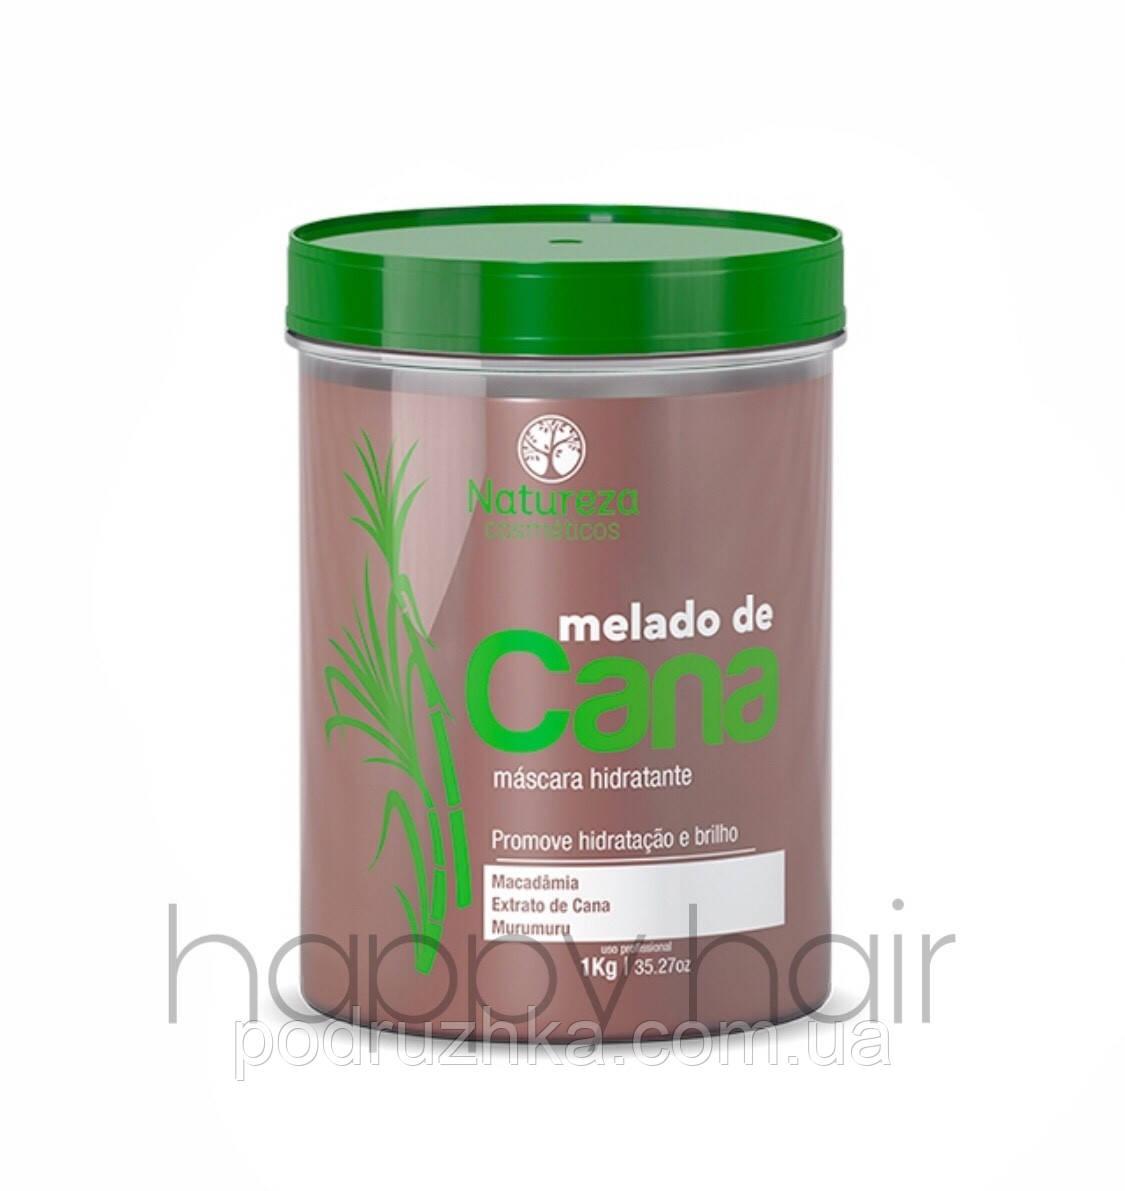 NATUREZA Melado de Cana Máscara Hidratante ботекс-гиперувлажнение для волос 500 г